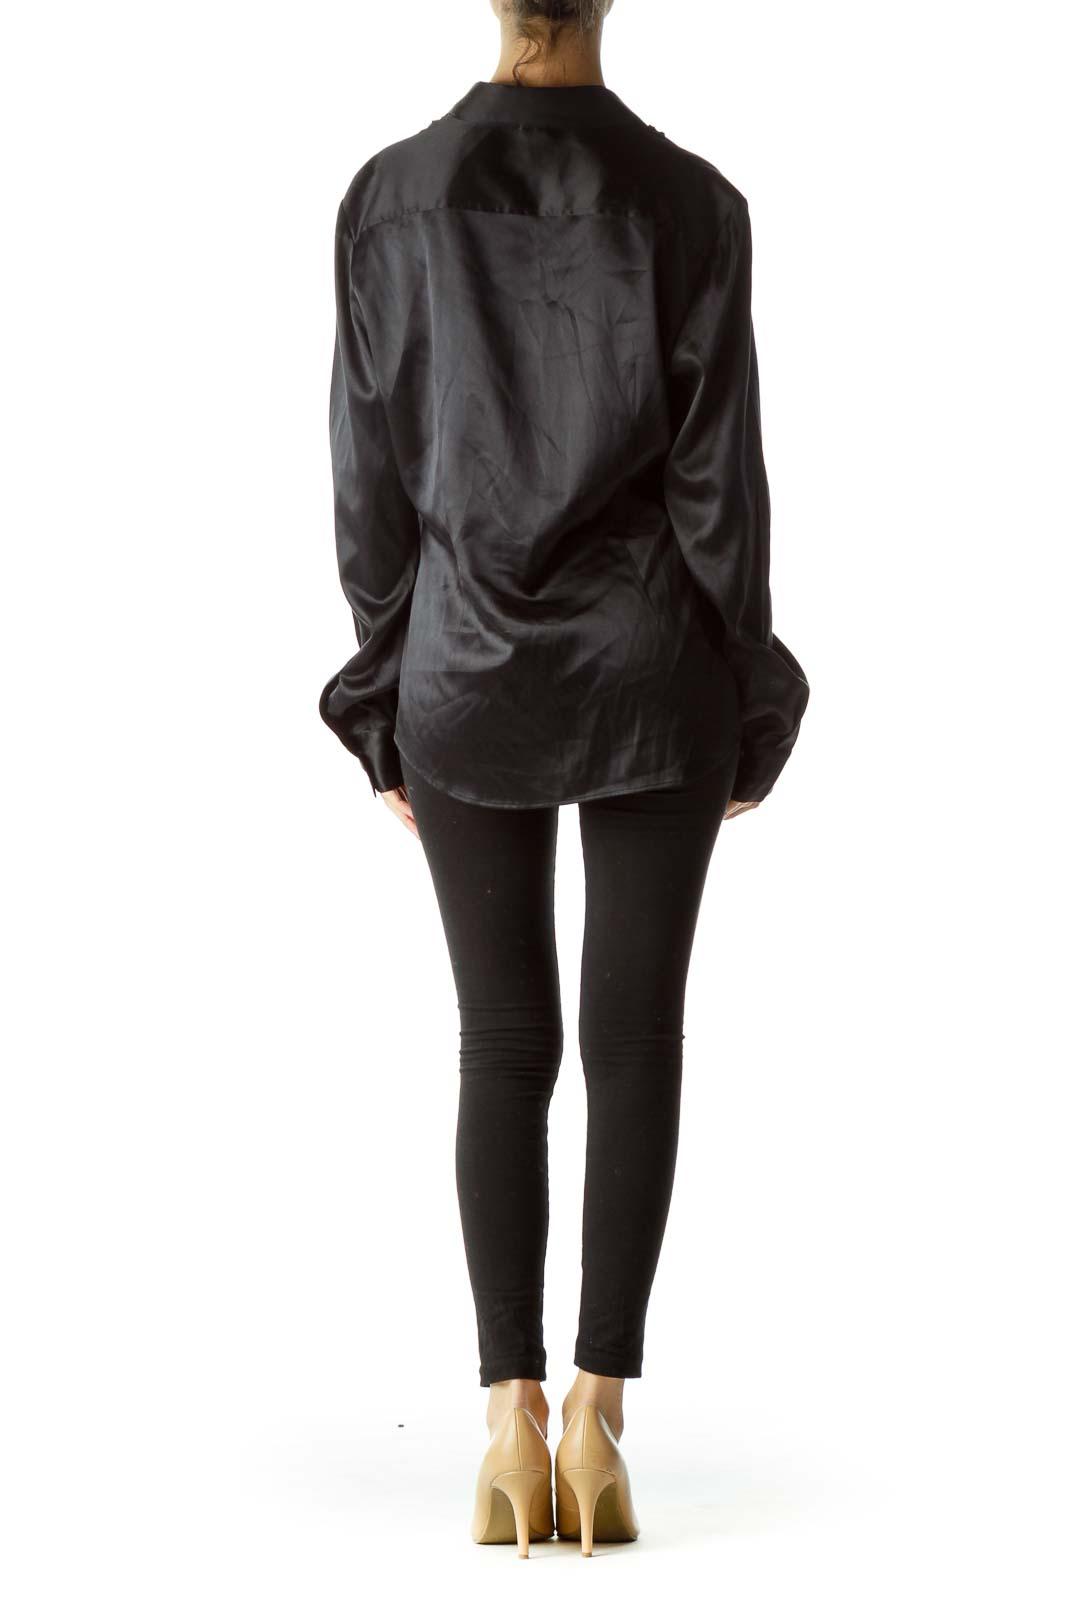 Black Short Front Ruffles Collared Shirt